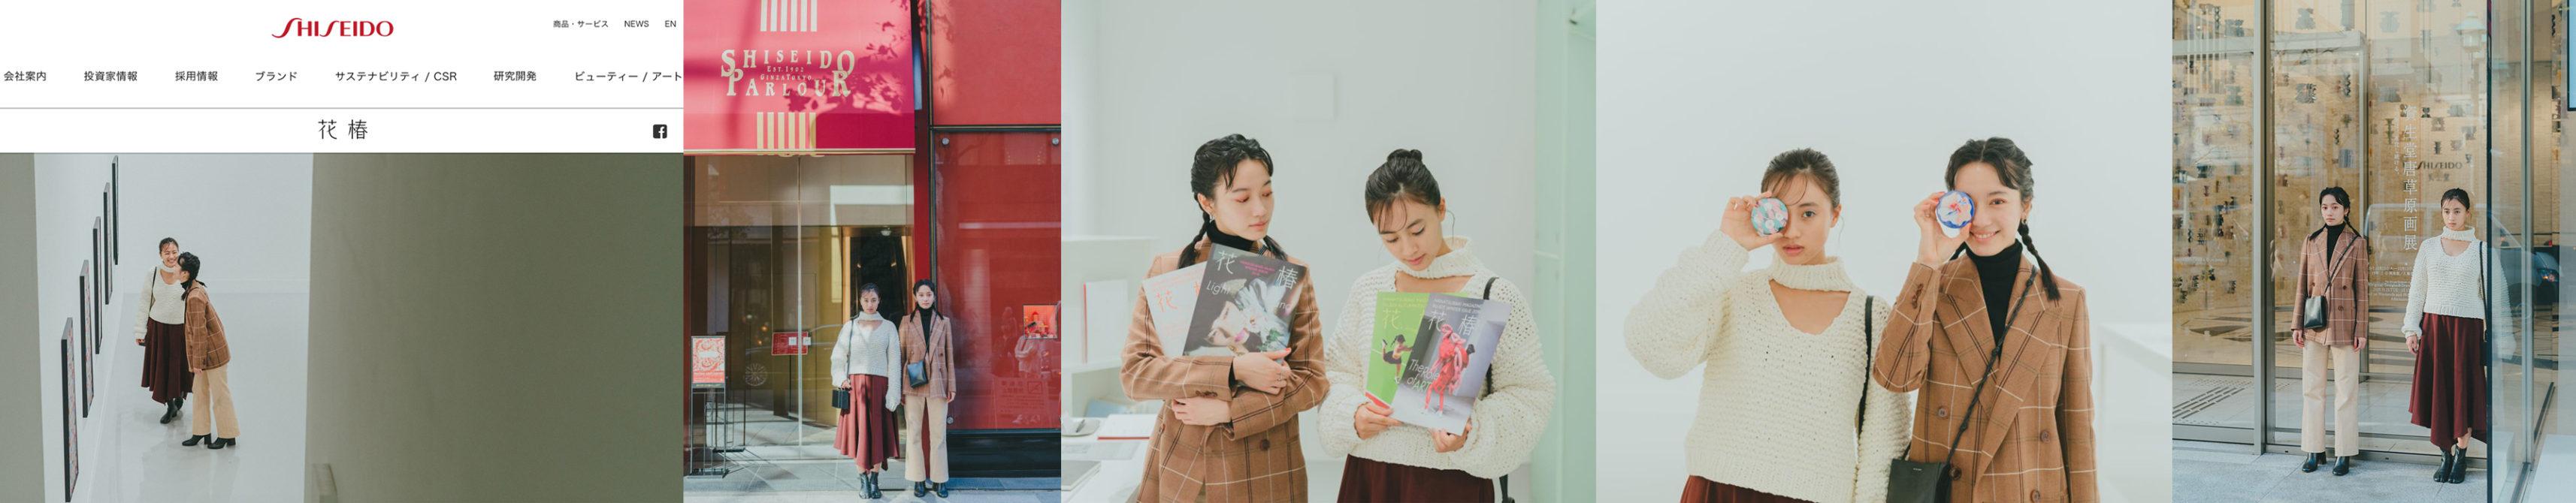 SHISEIDO 花椿 2019.11